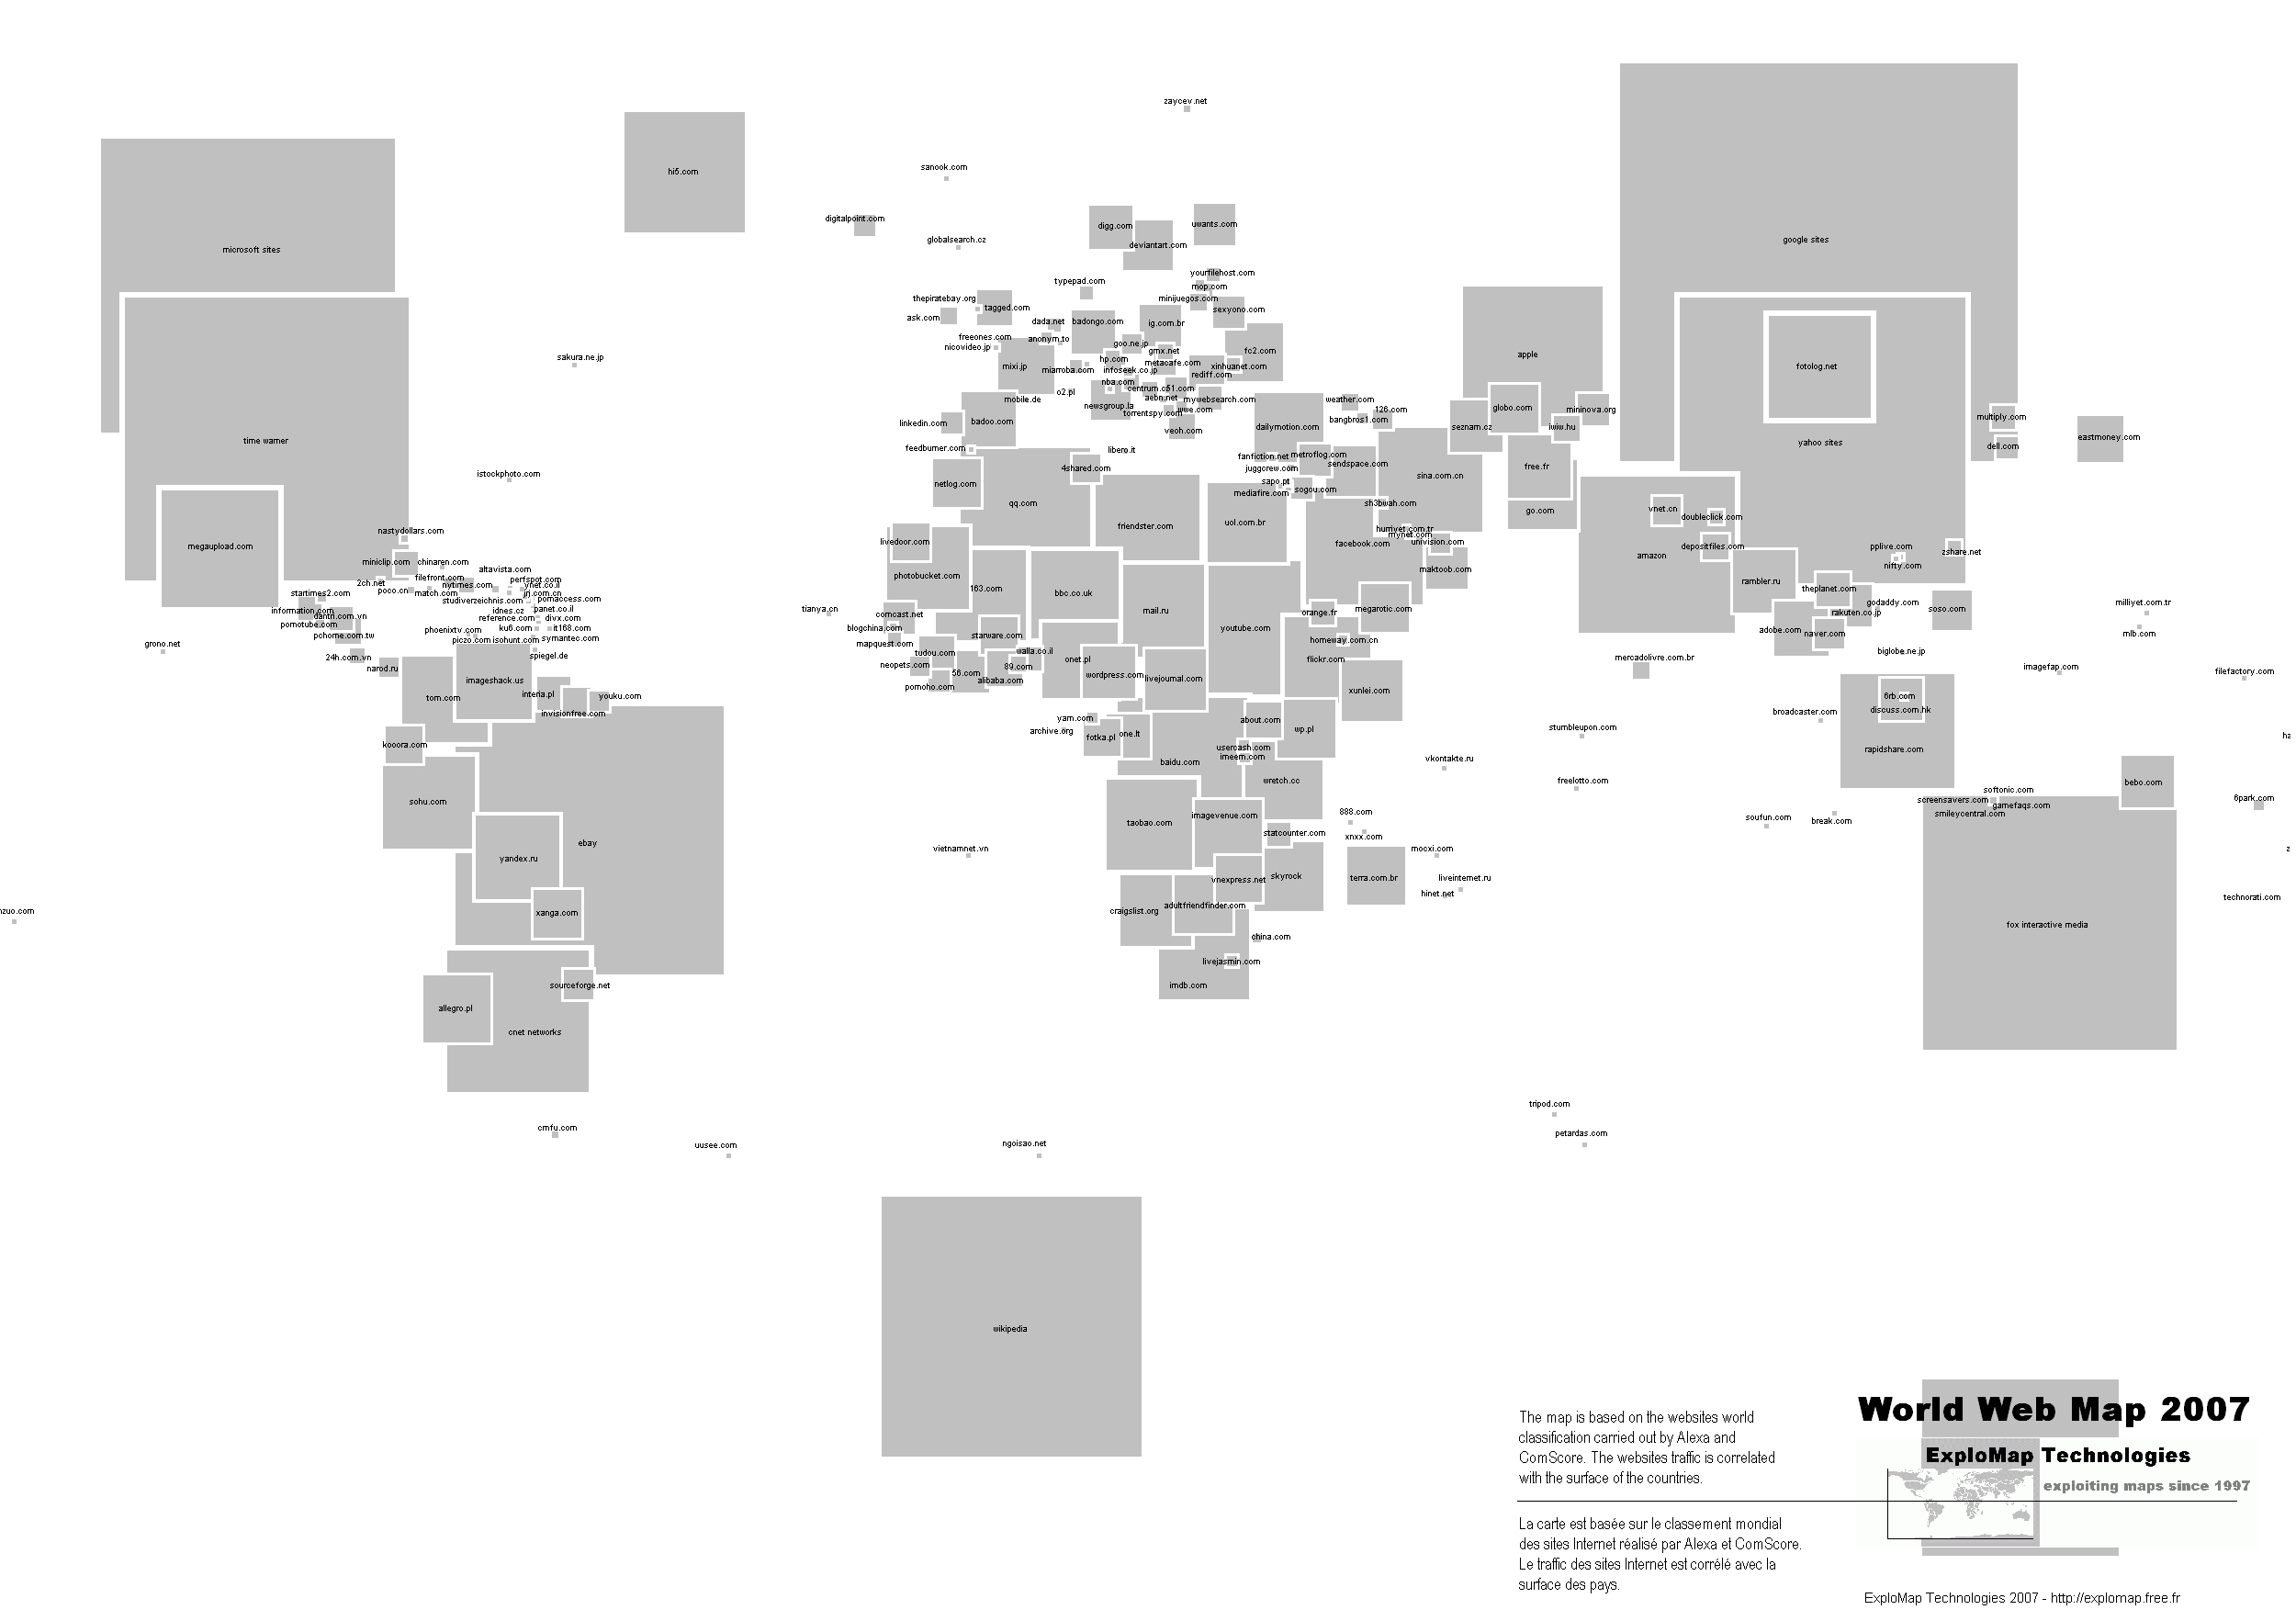 imperis internet